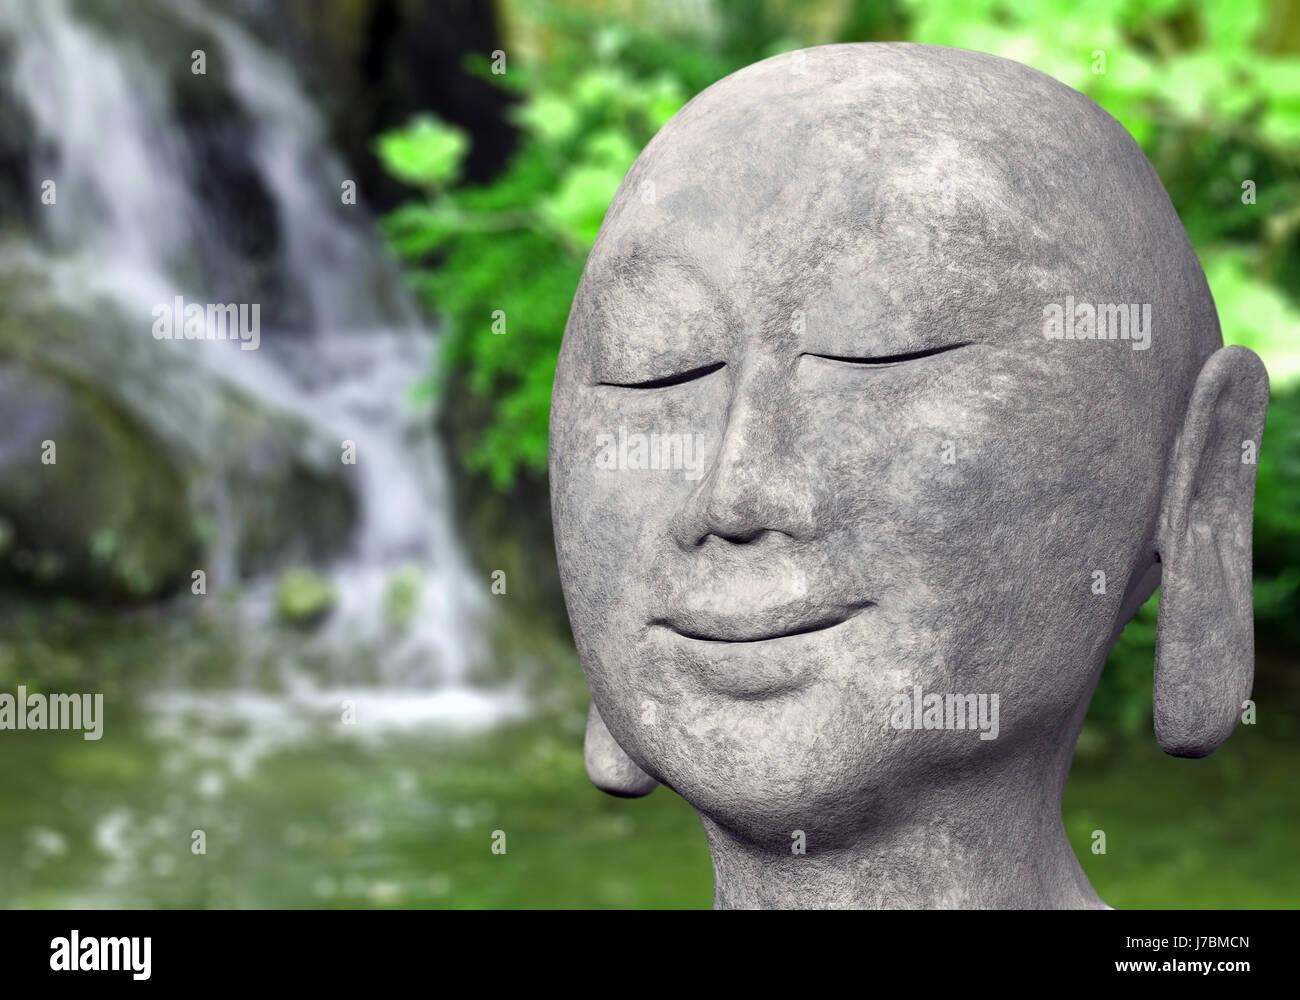 Garden Stone Green Buddha Gardens Zen Grey Gray Water Head Laugh Stock Photo Alamy